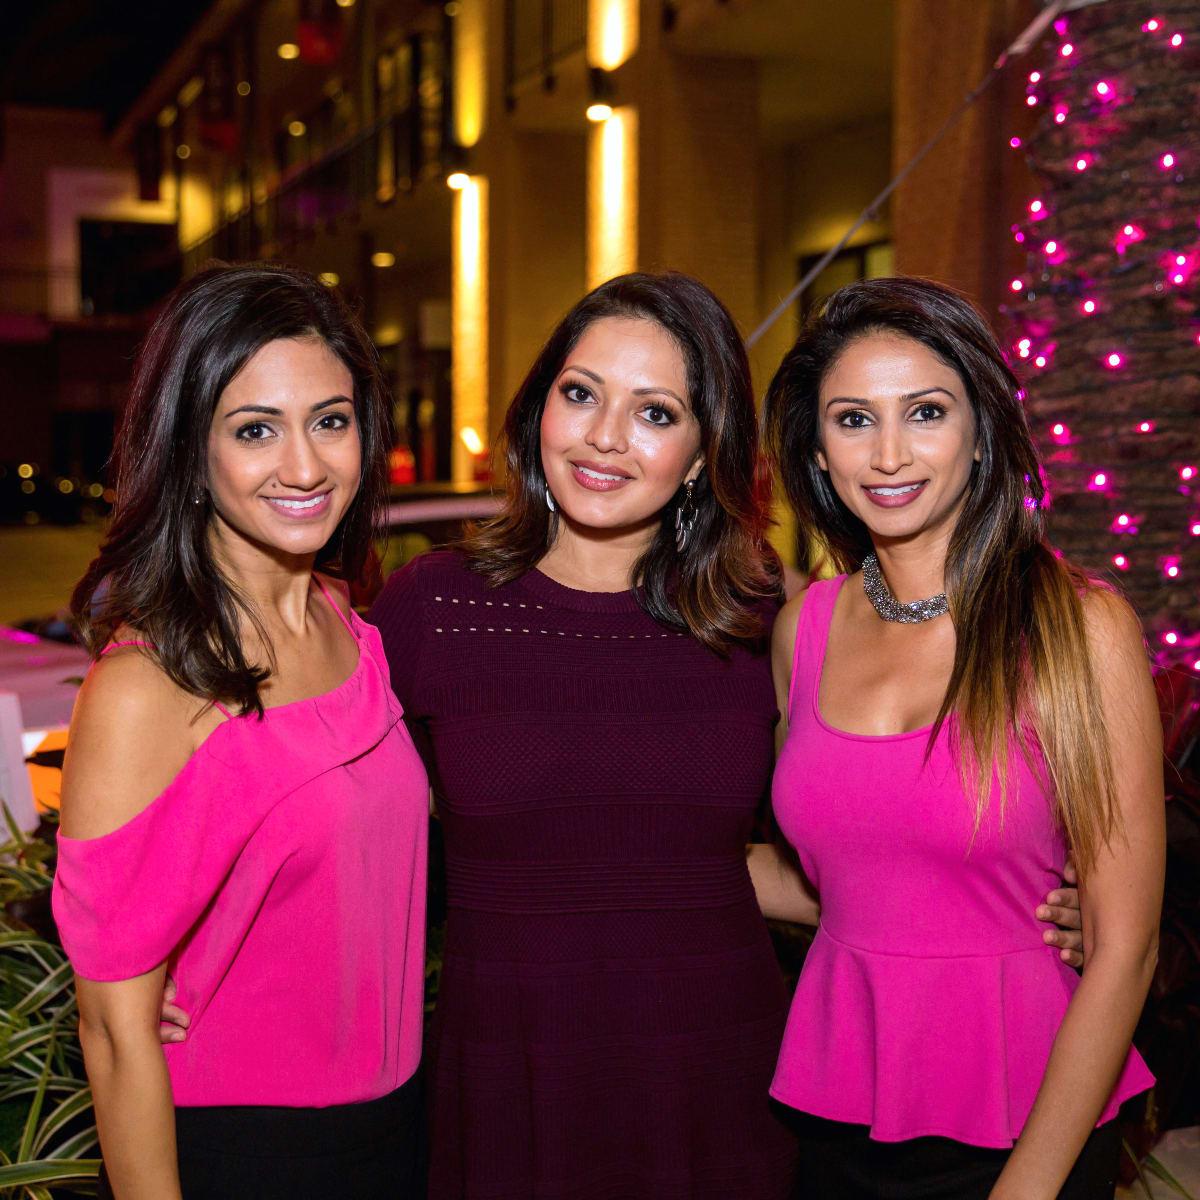 Houston, Marcy, West Ave Pink Party, October 2017, Rashi Vats, Rekha Muddaraj, Sapna Patel